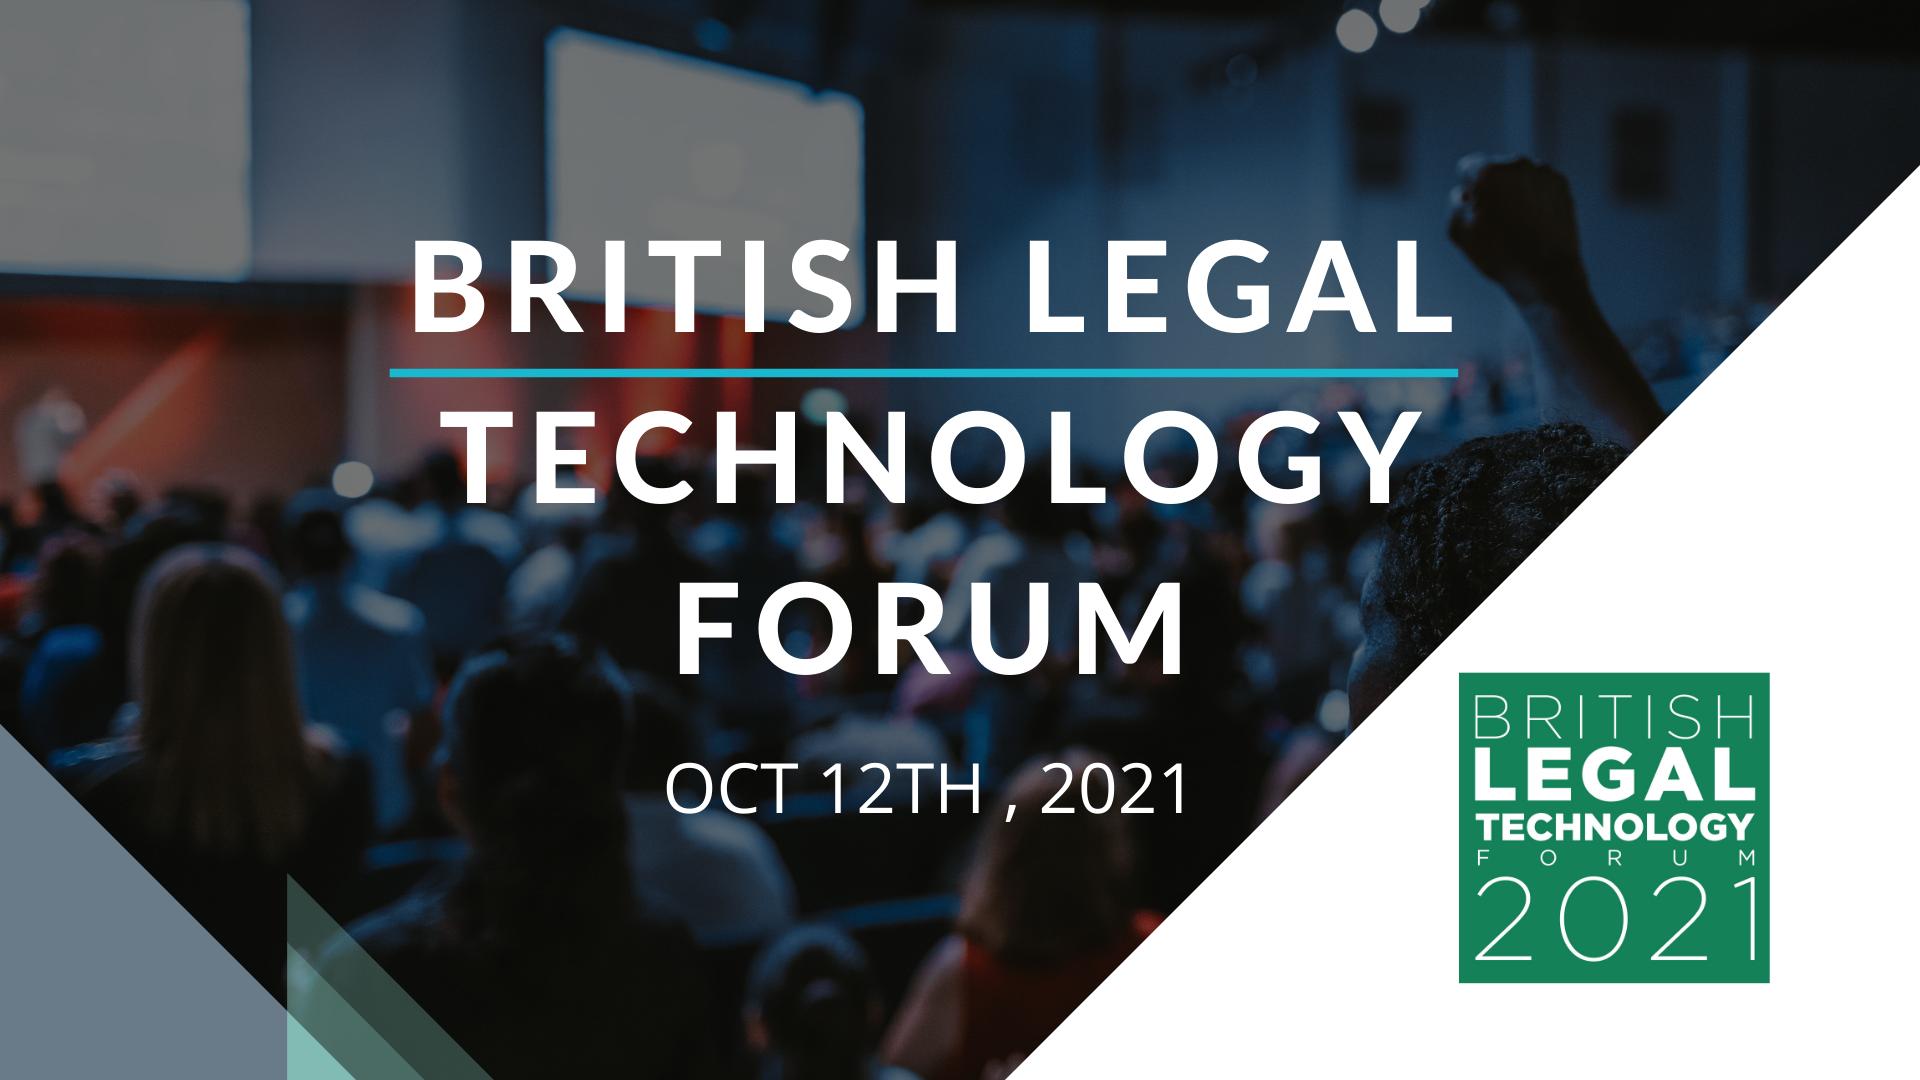 British Legal Technology Forum 2021